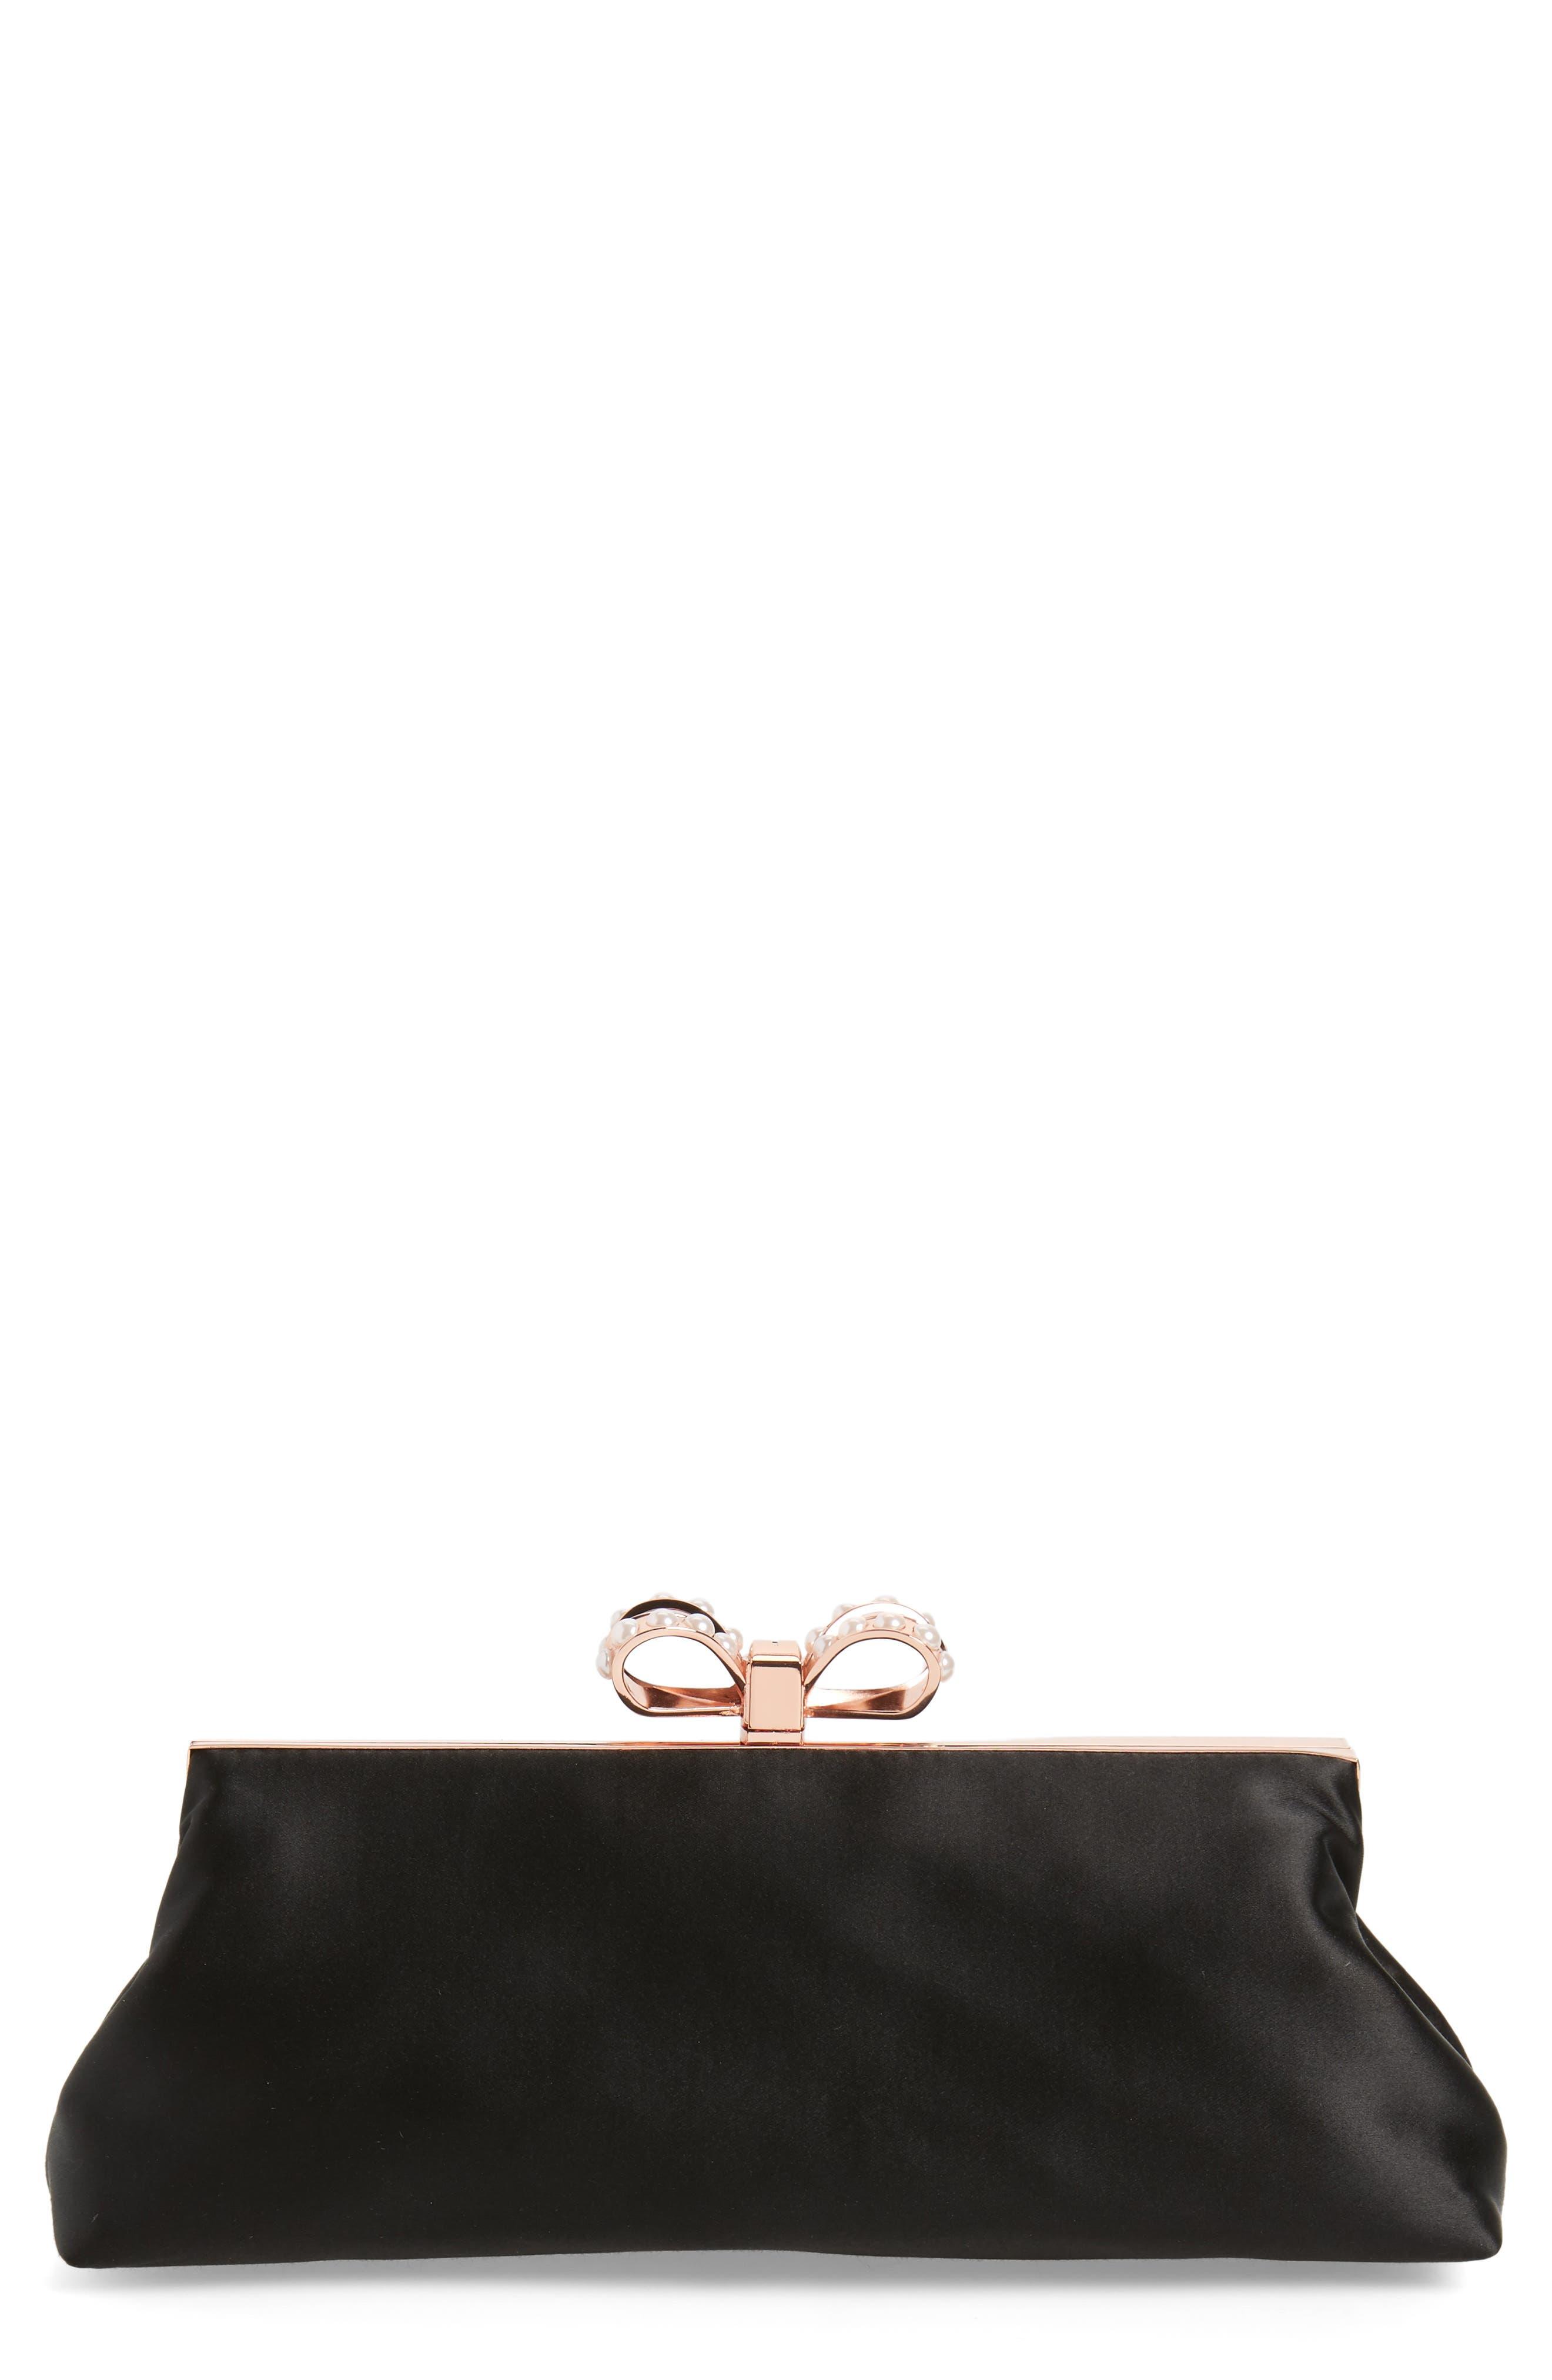 Georgaa Bow Clasp Evening Bag,                             Main thumbnail 1, color,                             Black